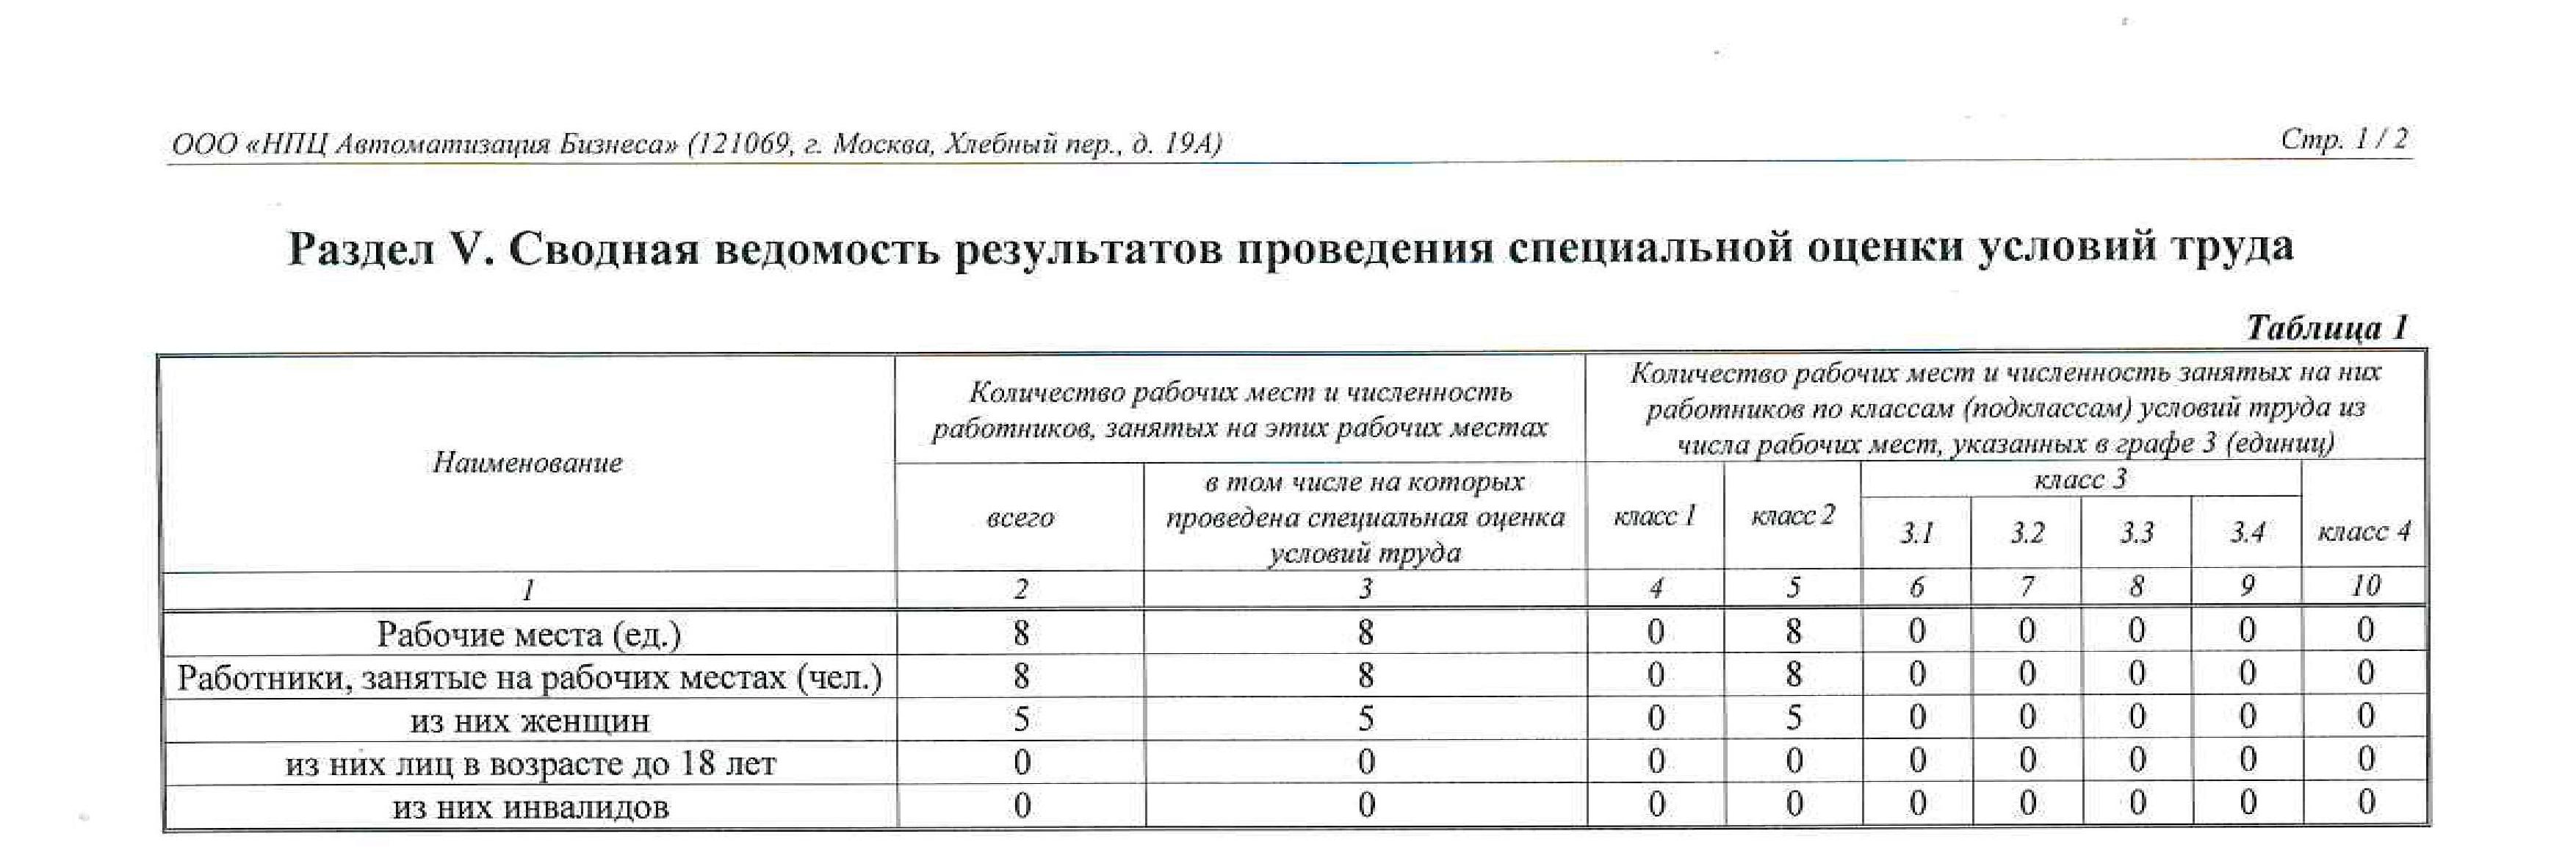 Таблица НПЦ АБ (СОУТ)